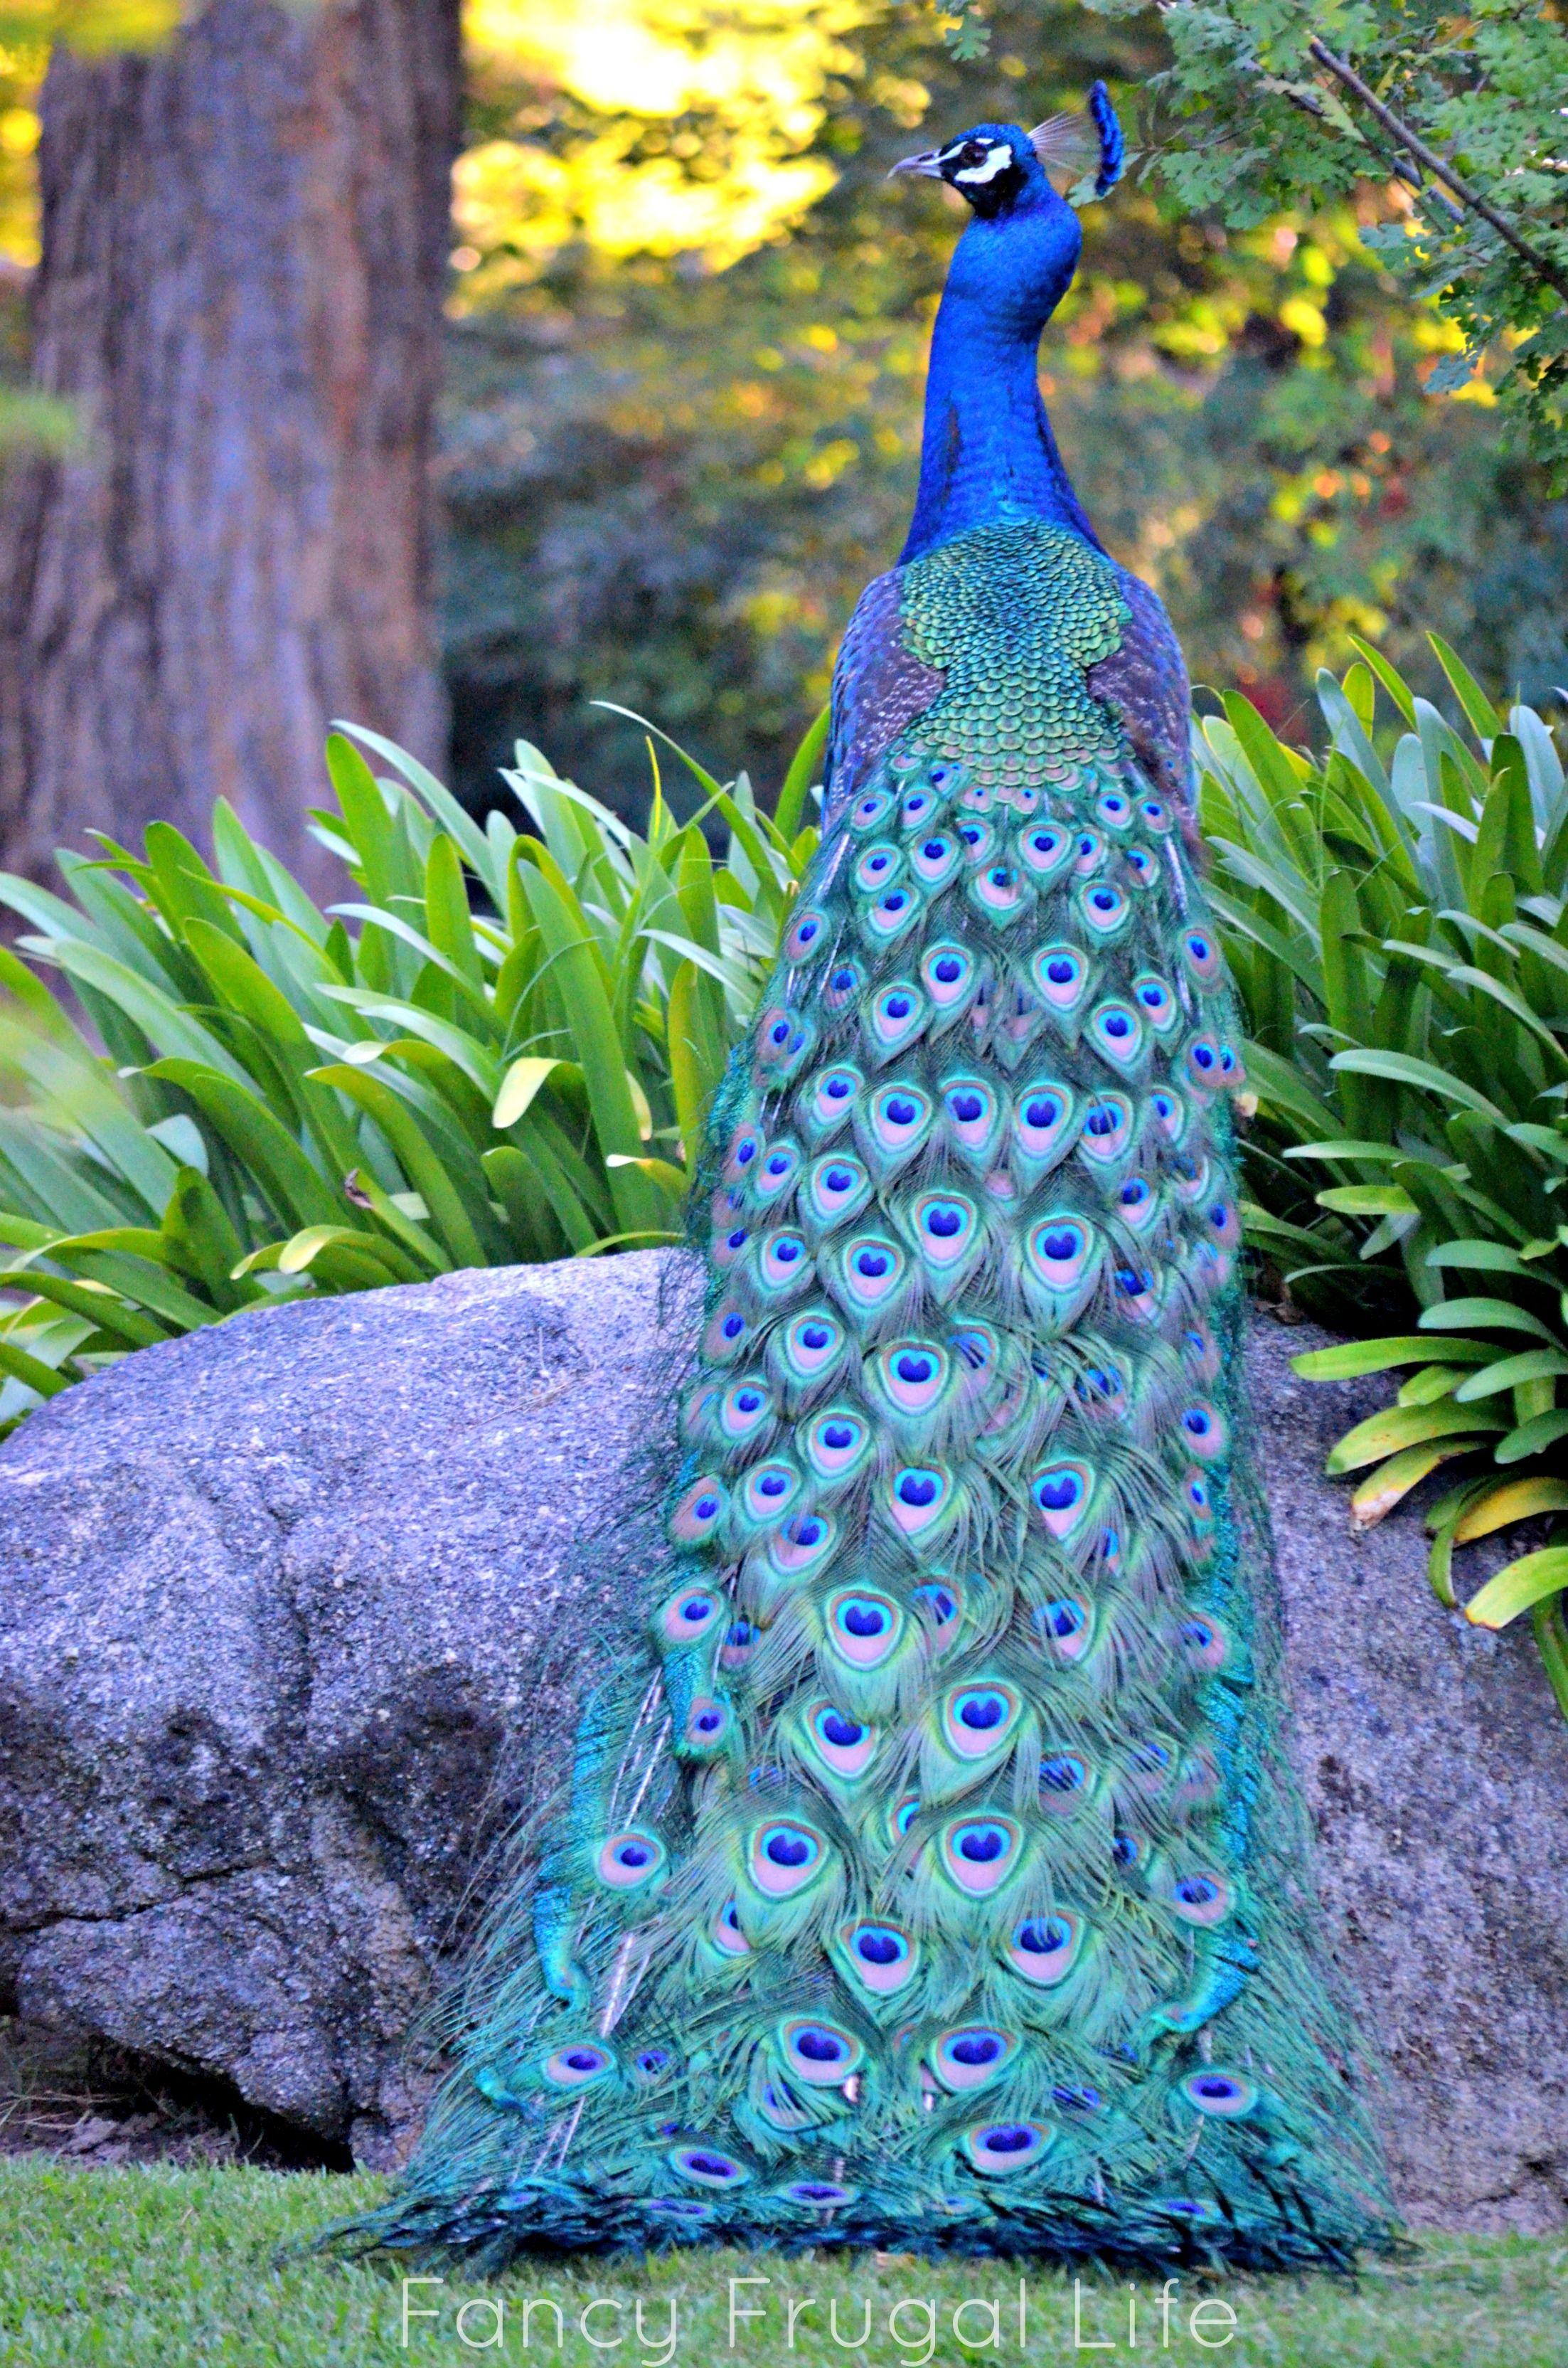 India-Blue Peacock [Pavo cristatus] - Just turning the ... - photo#14